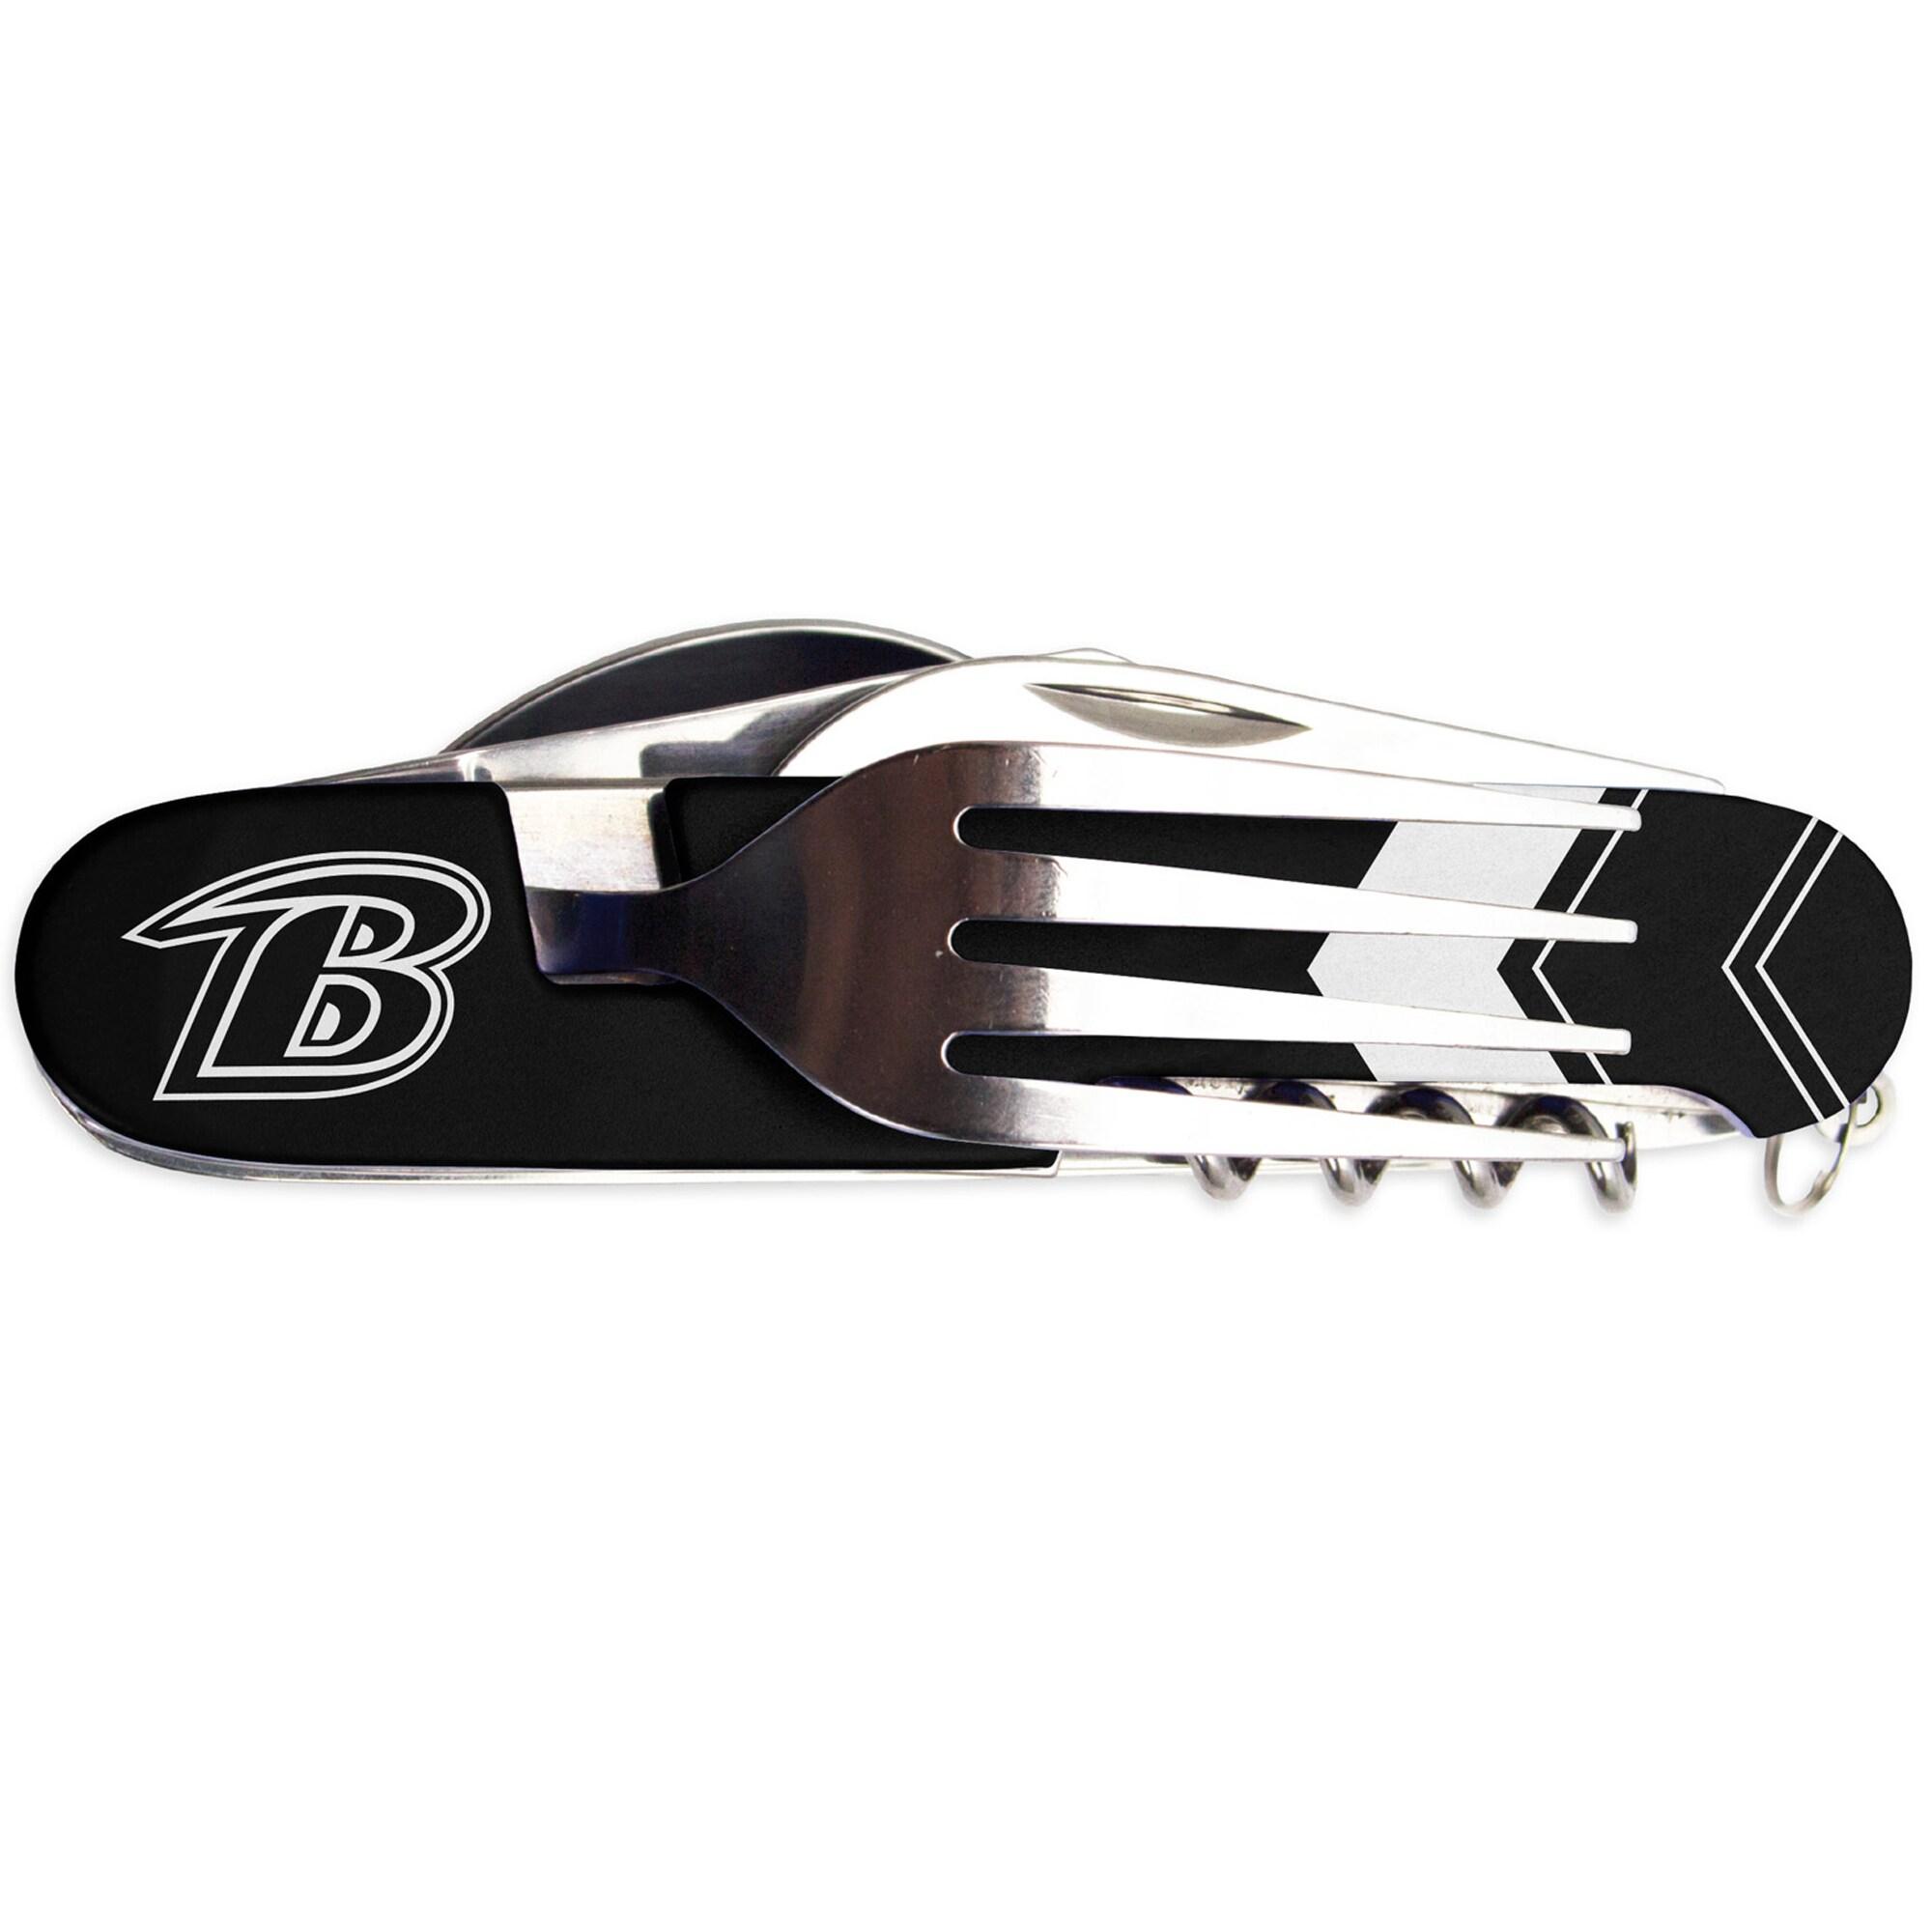 Baltimore Ravens Utensil Multi-Tool - Black